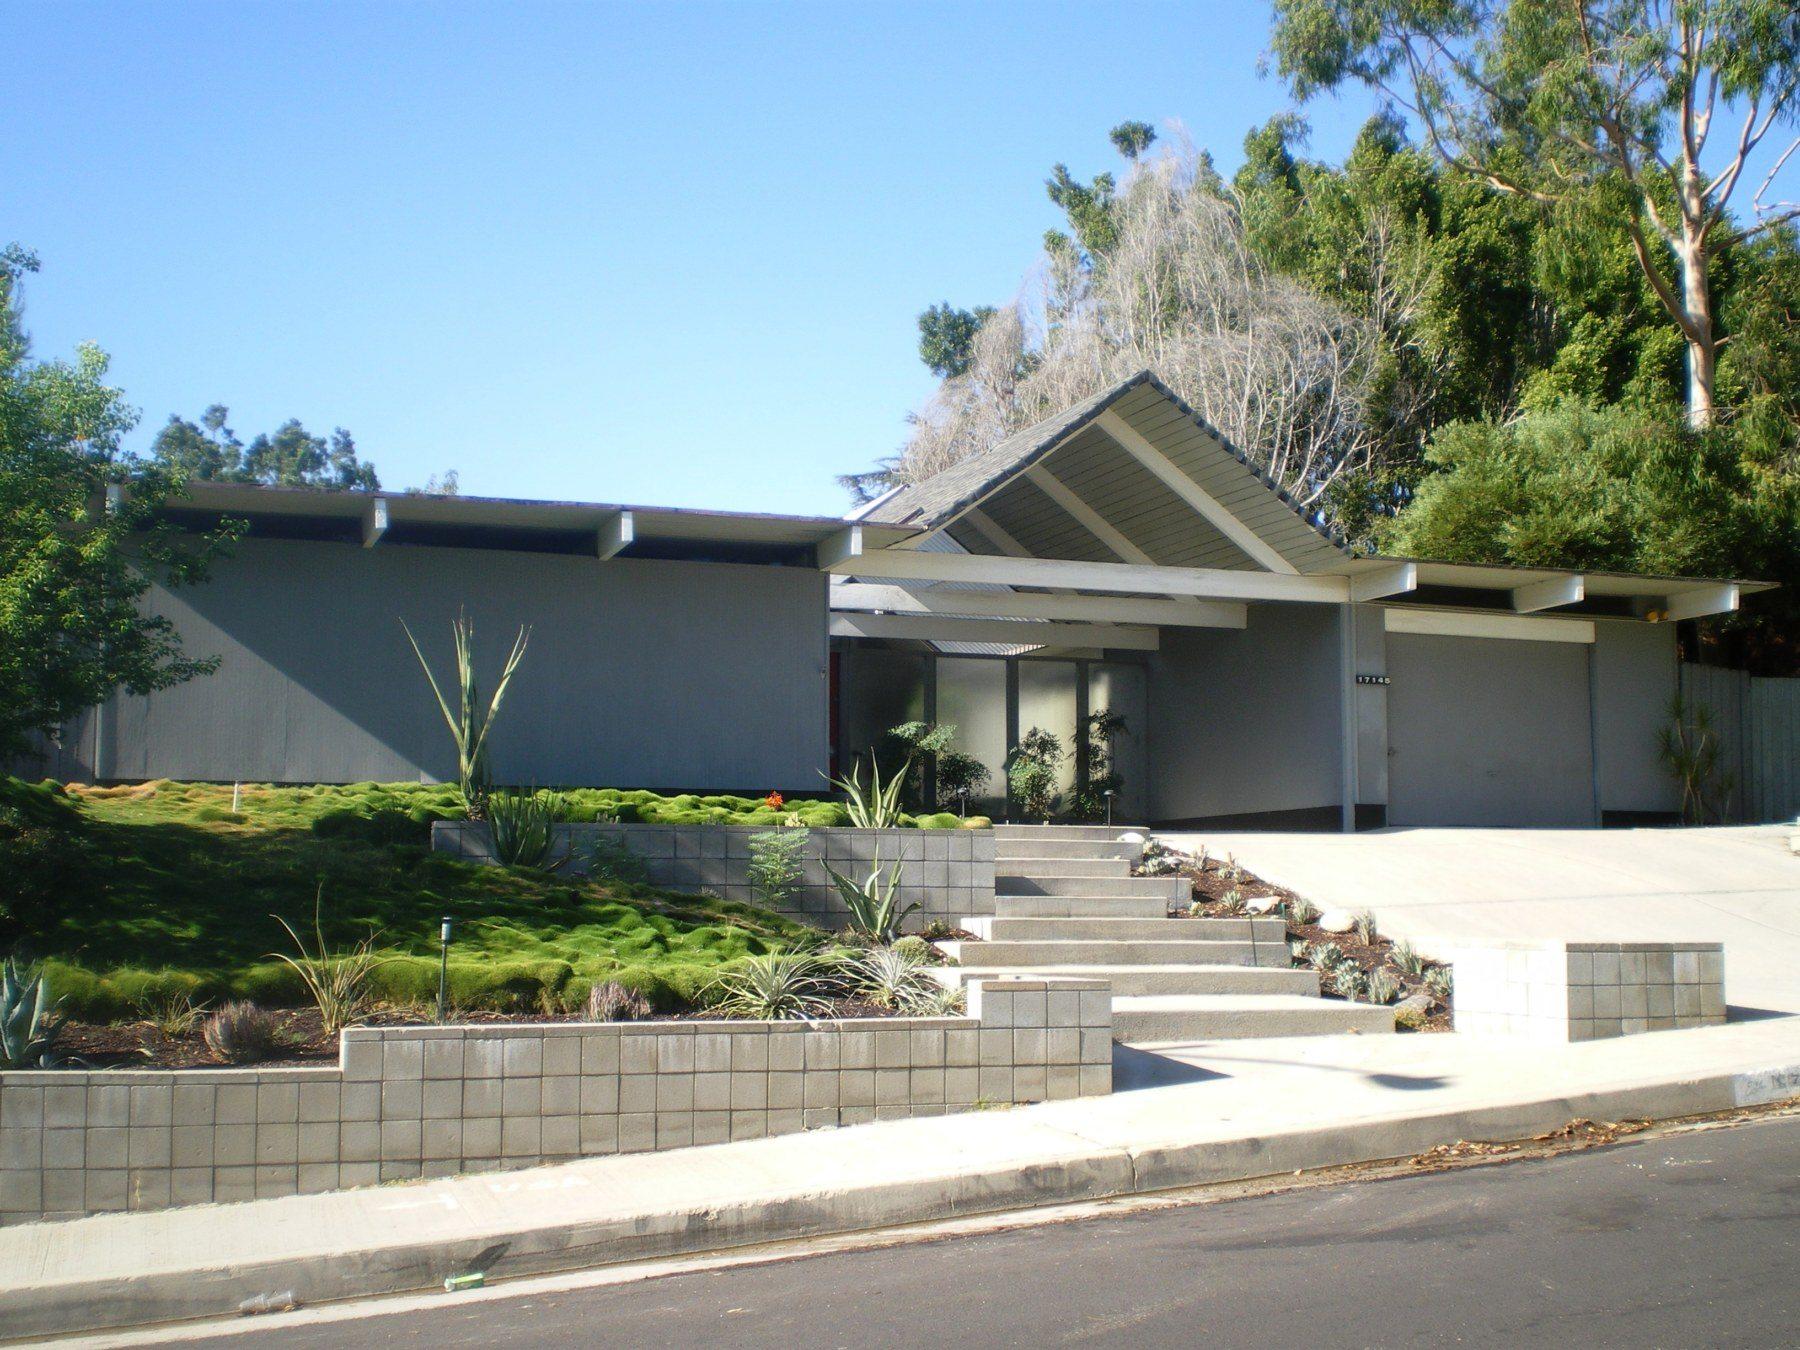 Image of: Mid Century Modern Architecture